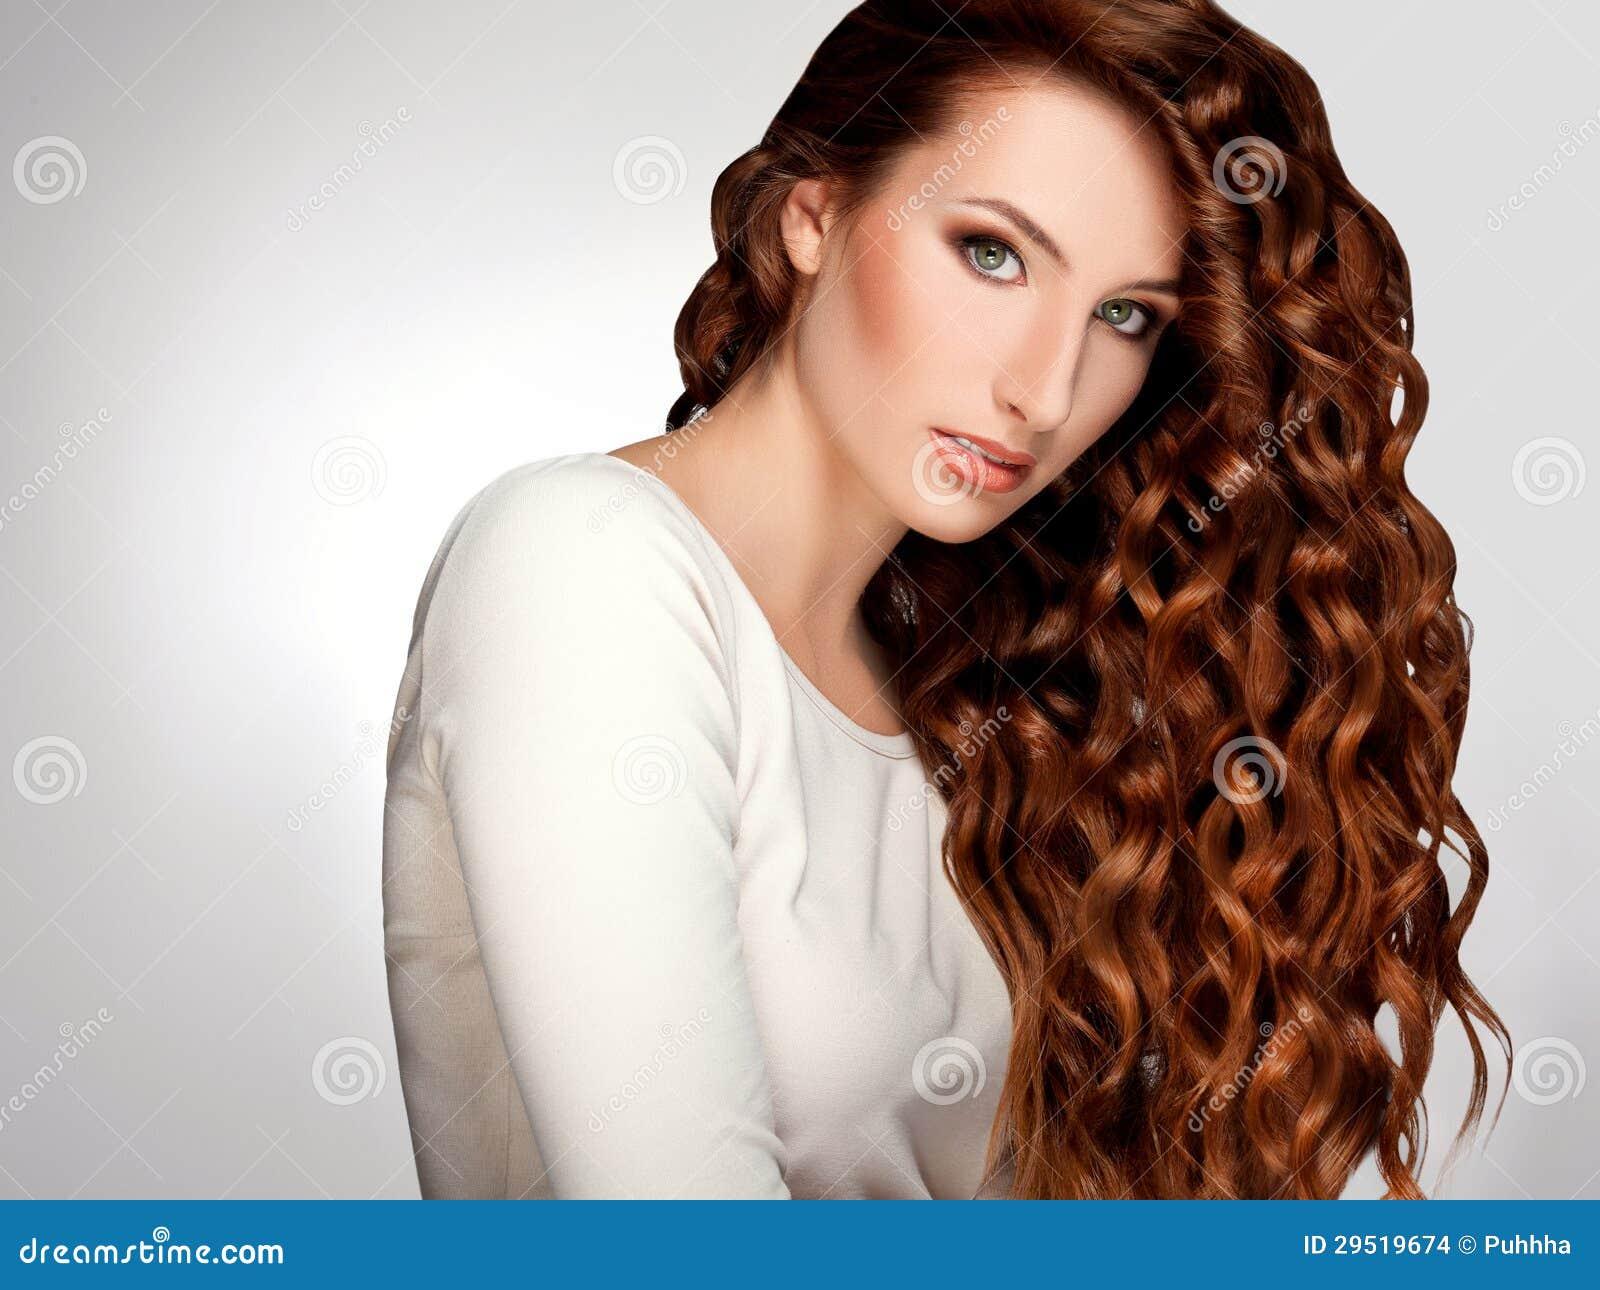 gratis sekswerker rood haar